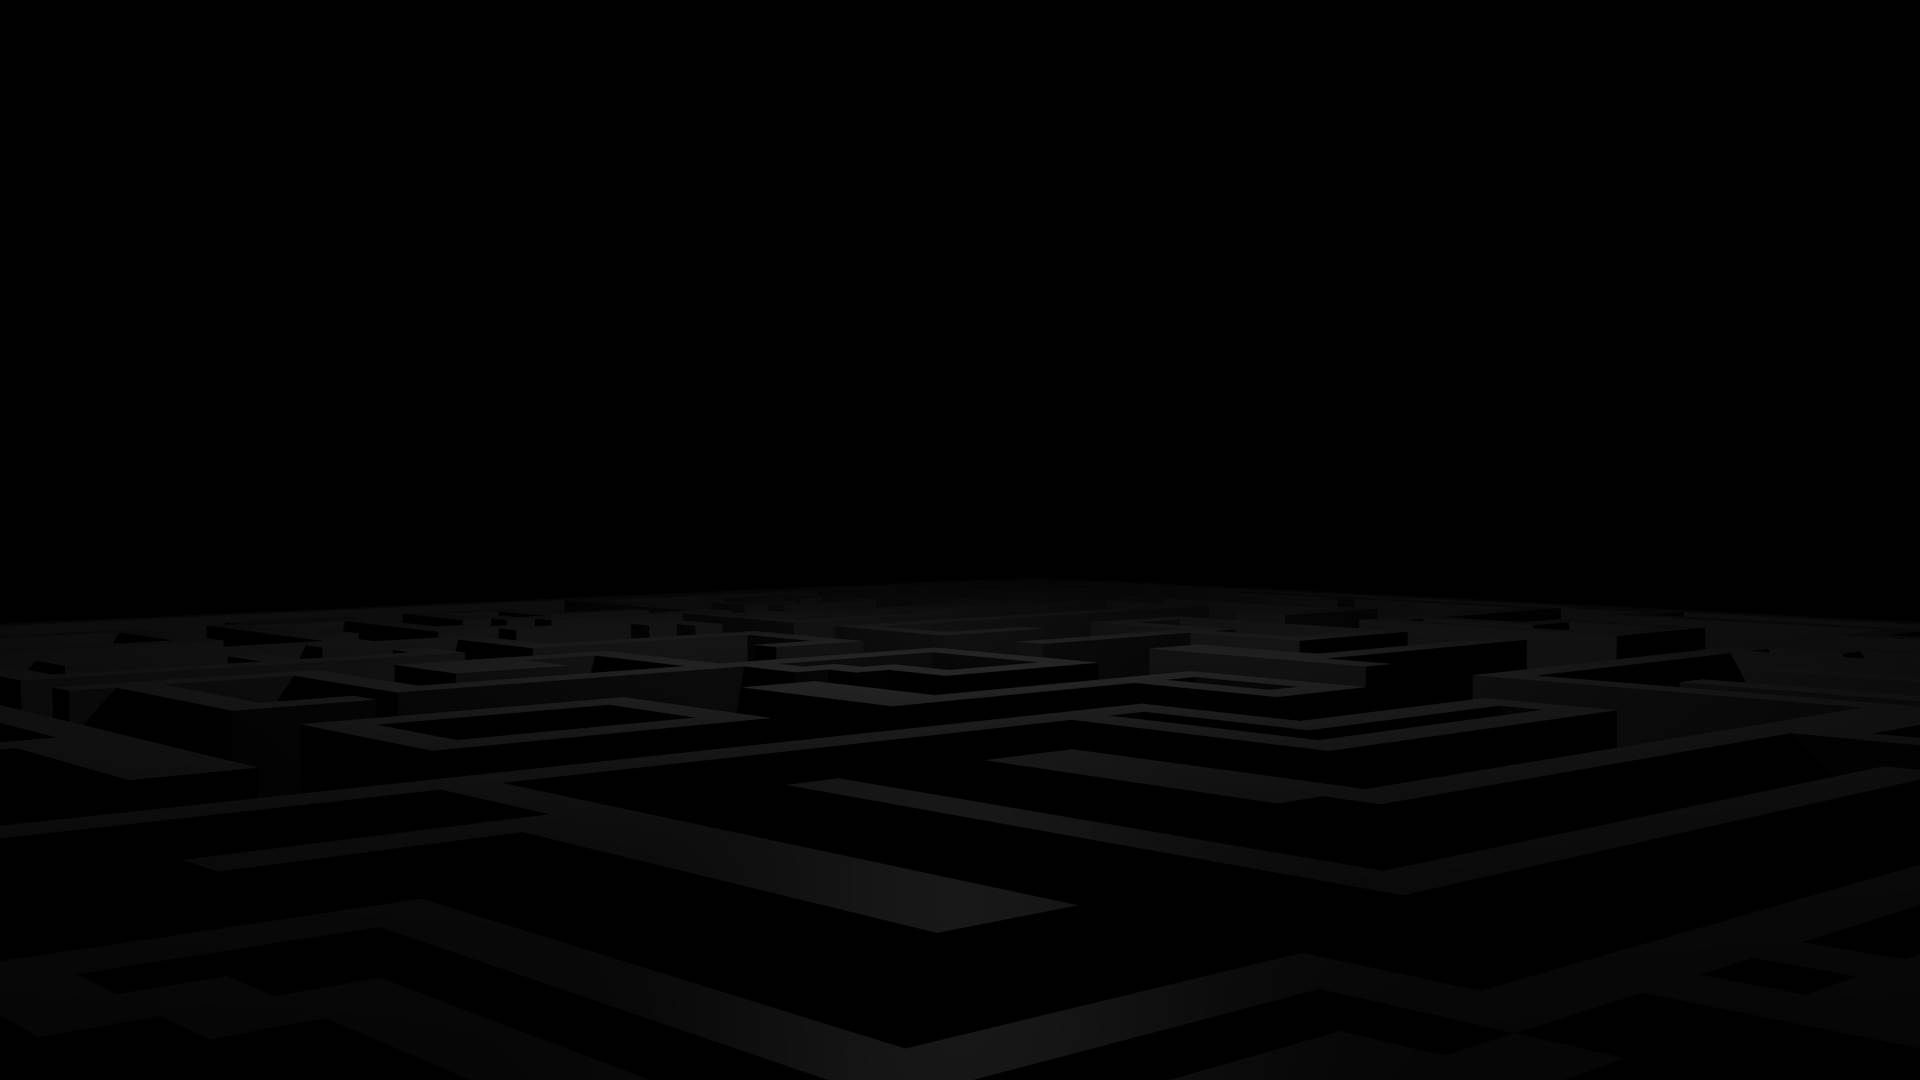 Dark Wallpaper Hd, Dark Hd Wallpapers For Free Download, Glaurel